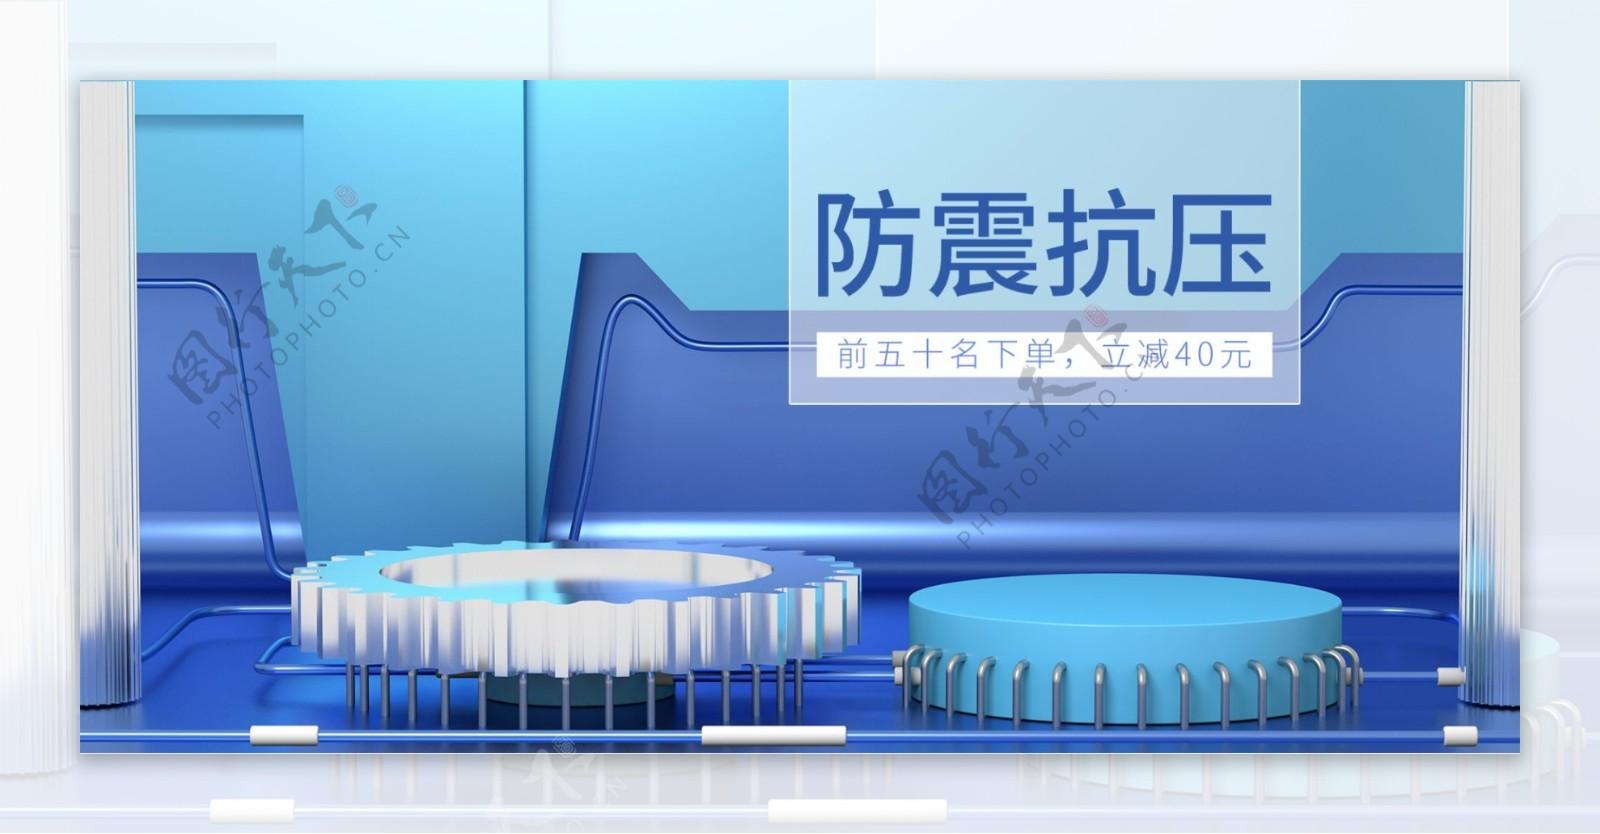 C4D蓝色工具箱淘宝电商海报banner